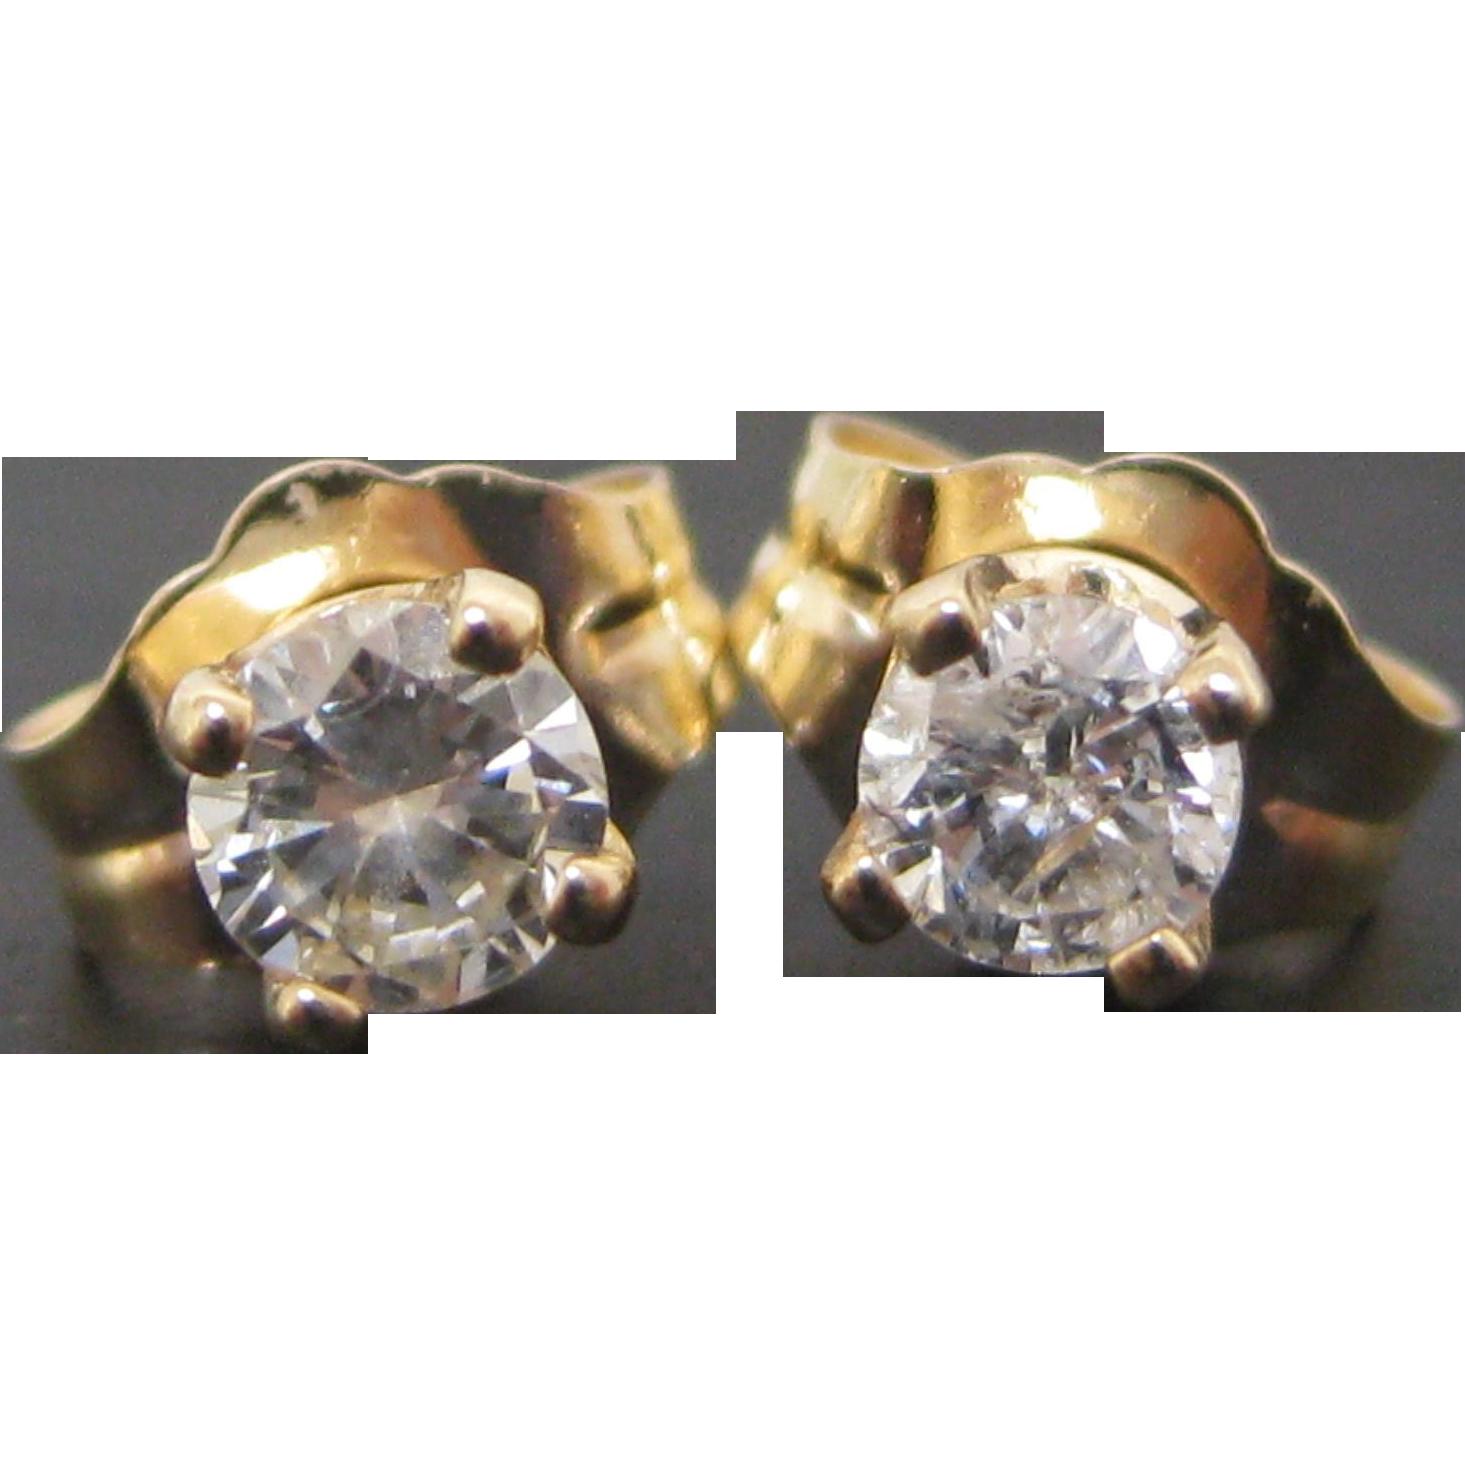 14 K Yellow Gold 0 25 Carat Diamond Stud Earrings From